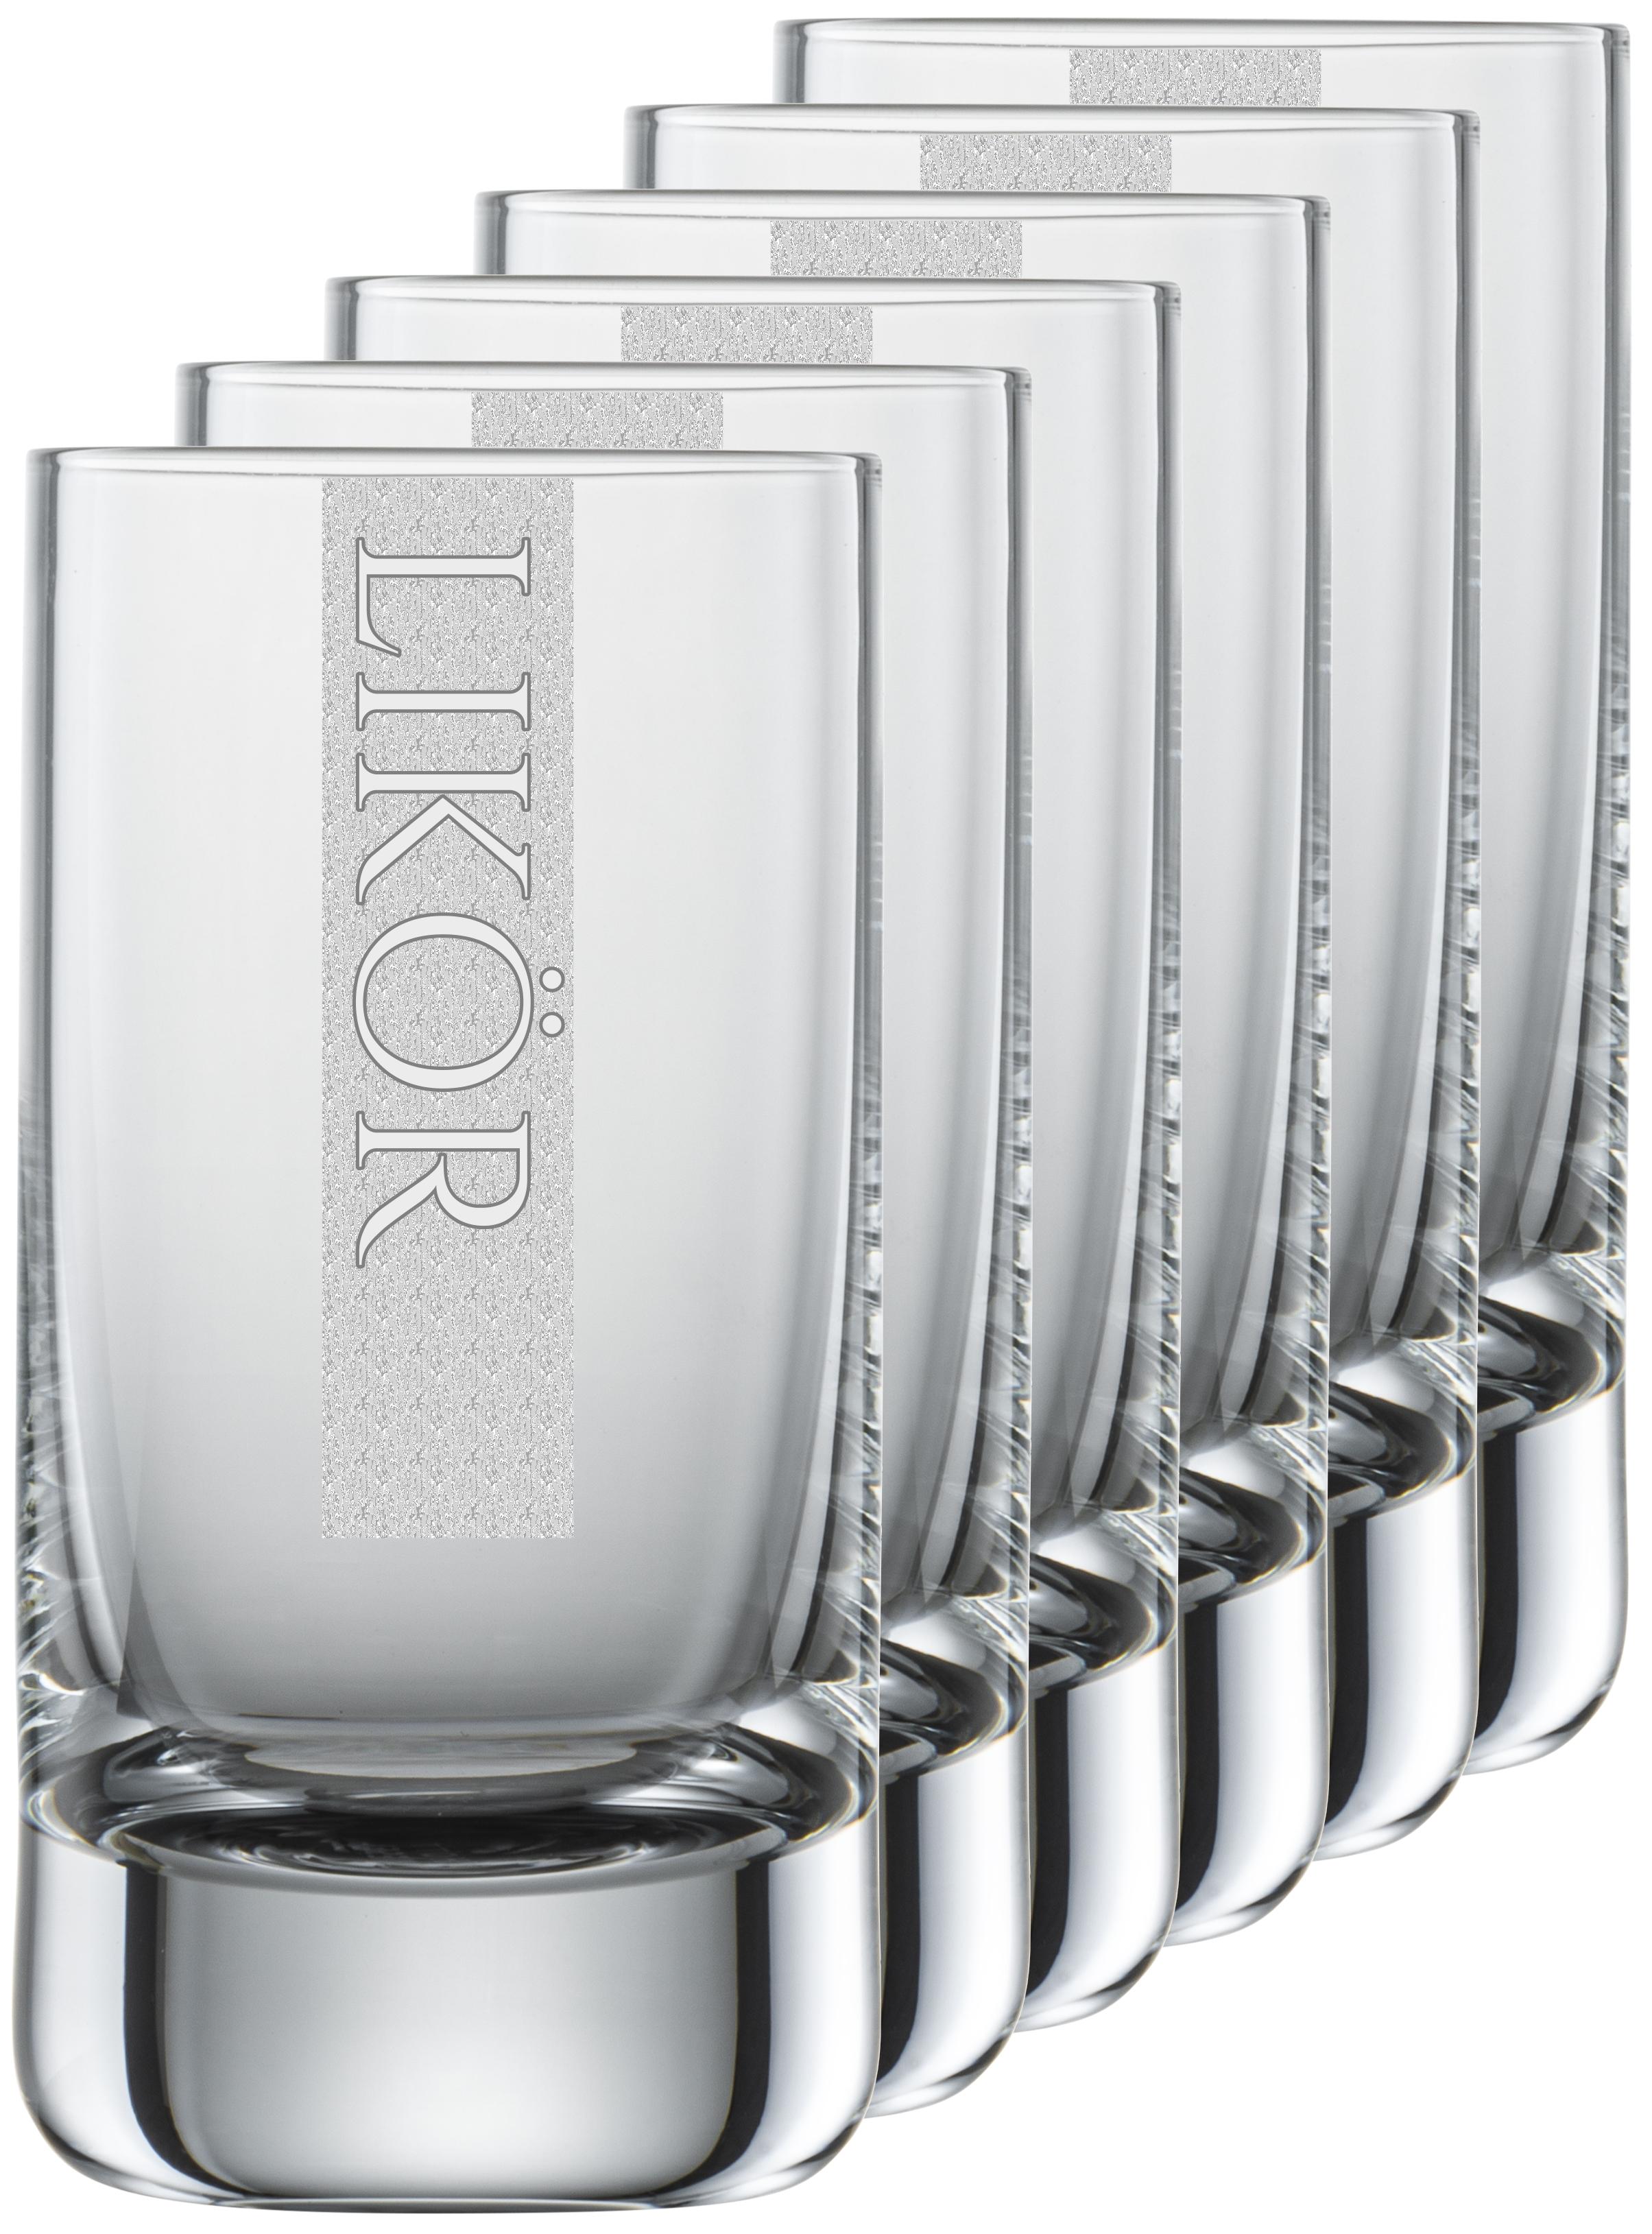 LIKÖR Gläser   6 Stück 5cl Schott Schnapsglas   CoolGlas